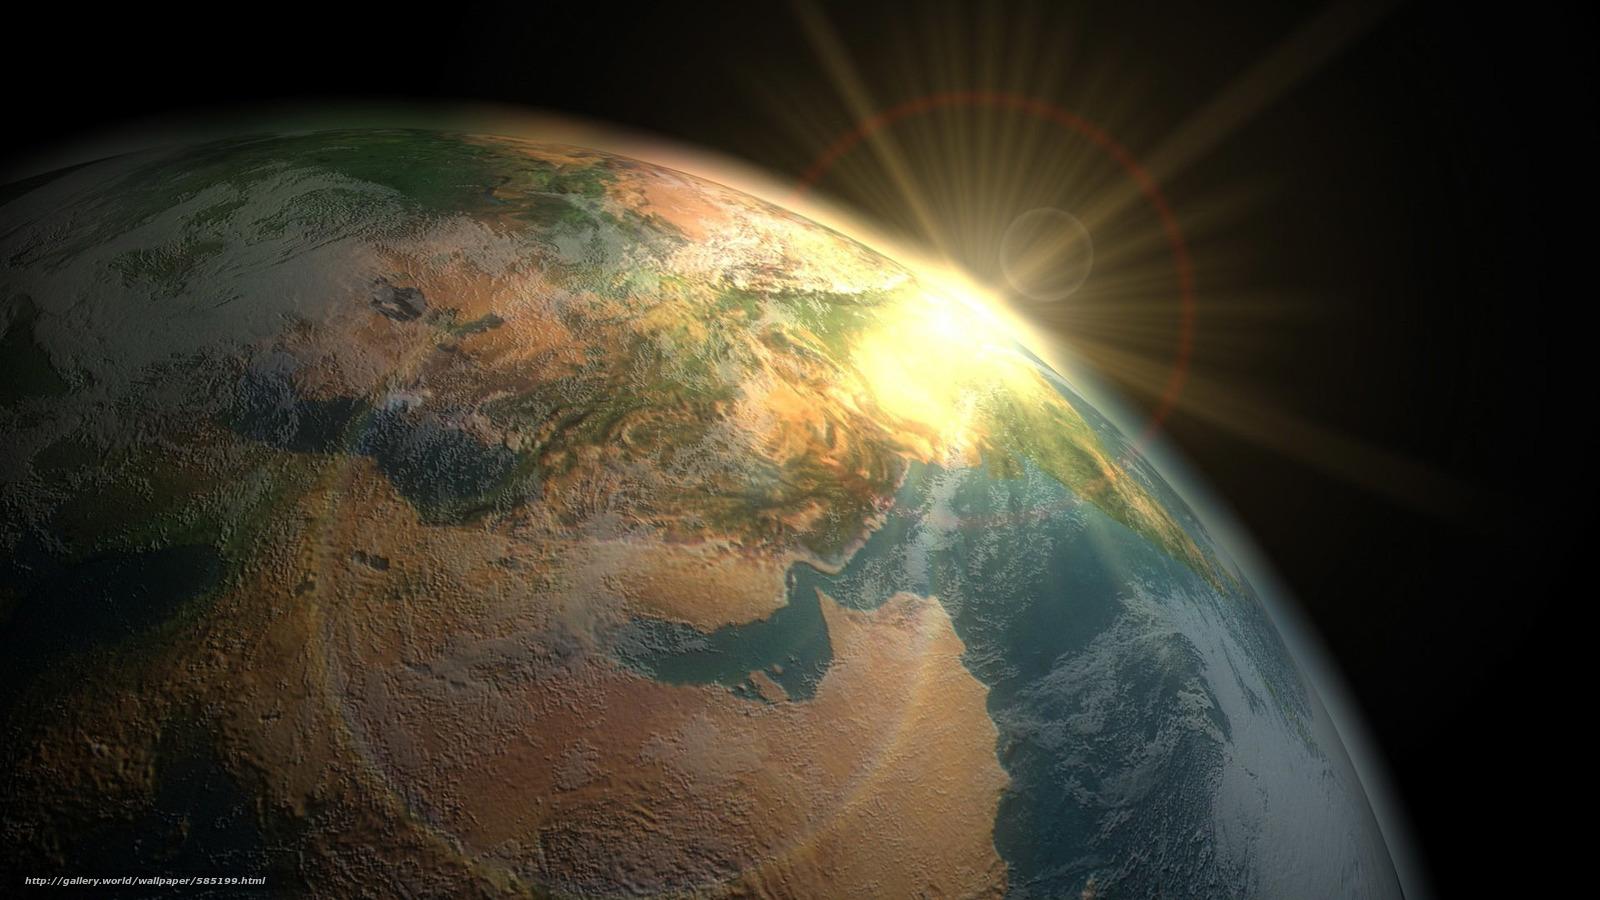 Tlcharger fond d 39 ecran vue de l 39 espace terres lever du for Sfondi desktop universo